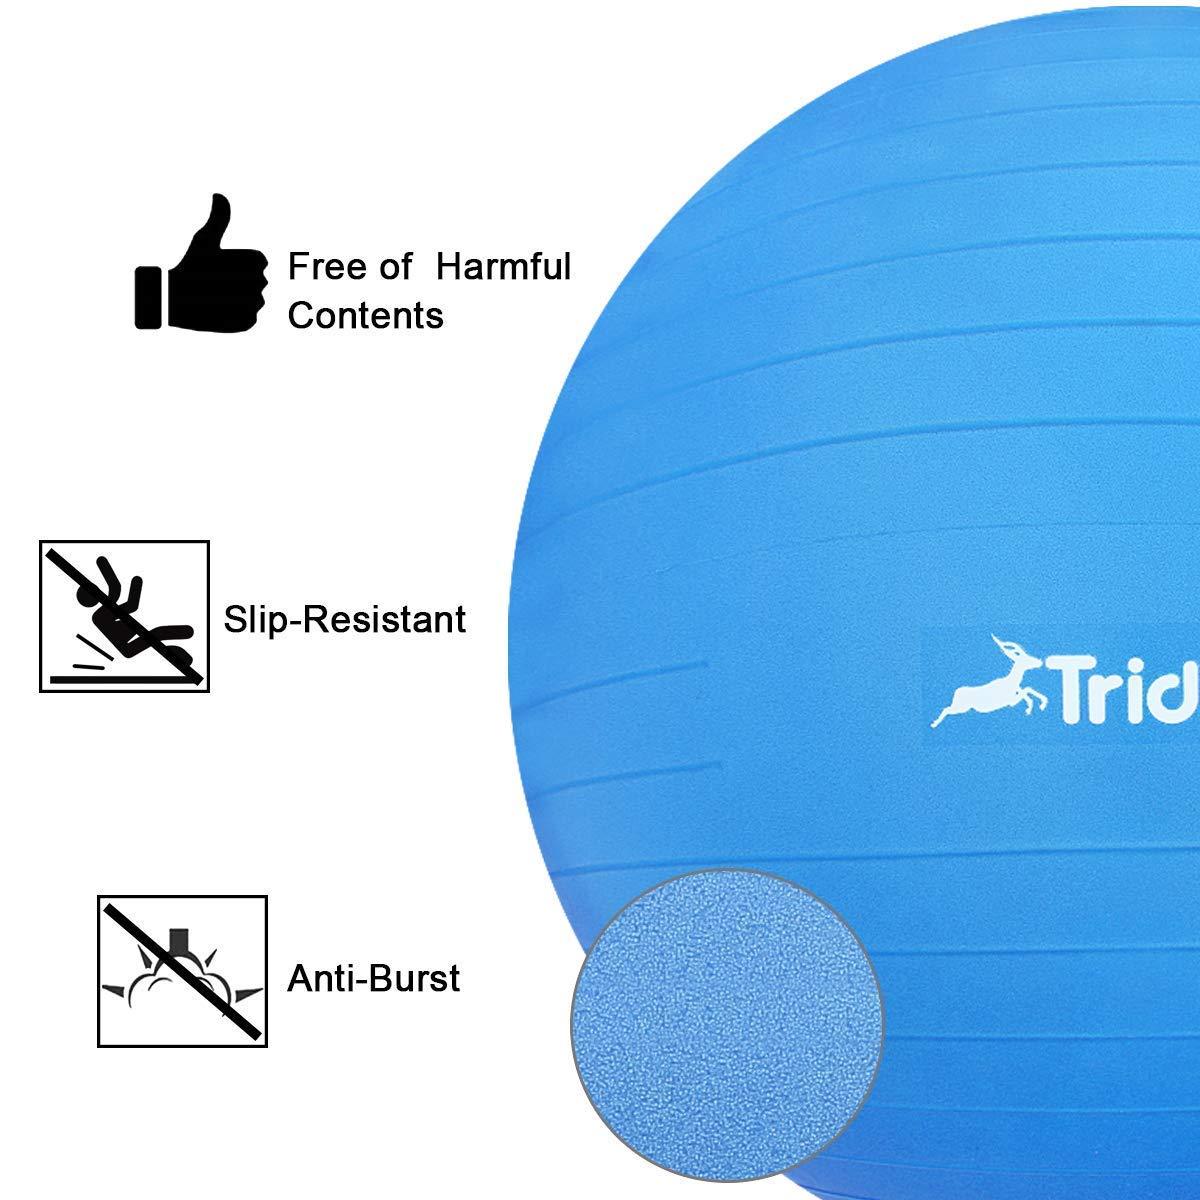 Trideer 45-85cm Exercise Ball, Birthing Ball, Ball Chair, Yoga Pilate Fitness Balance Ball with Pump Plug Kit, Anti-Slip & Anti-Burst (Dark Blue, 65cm) by Trideer (Image #7)